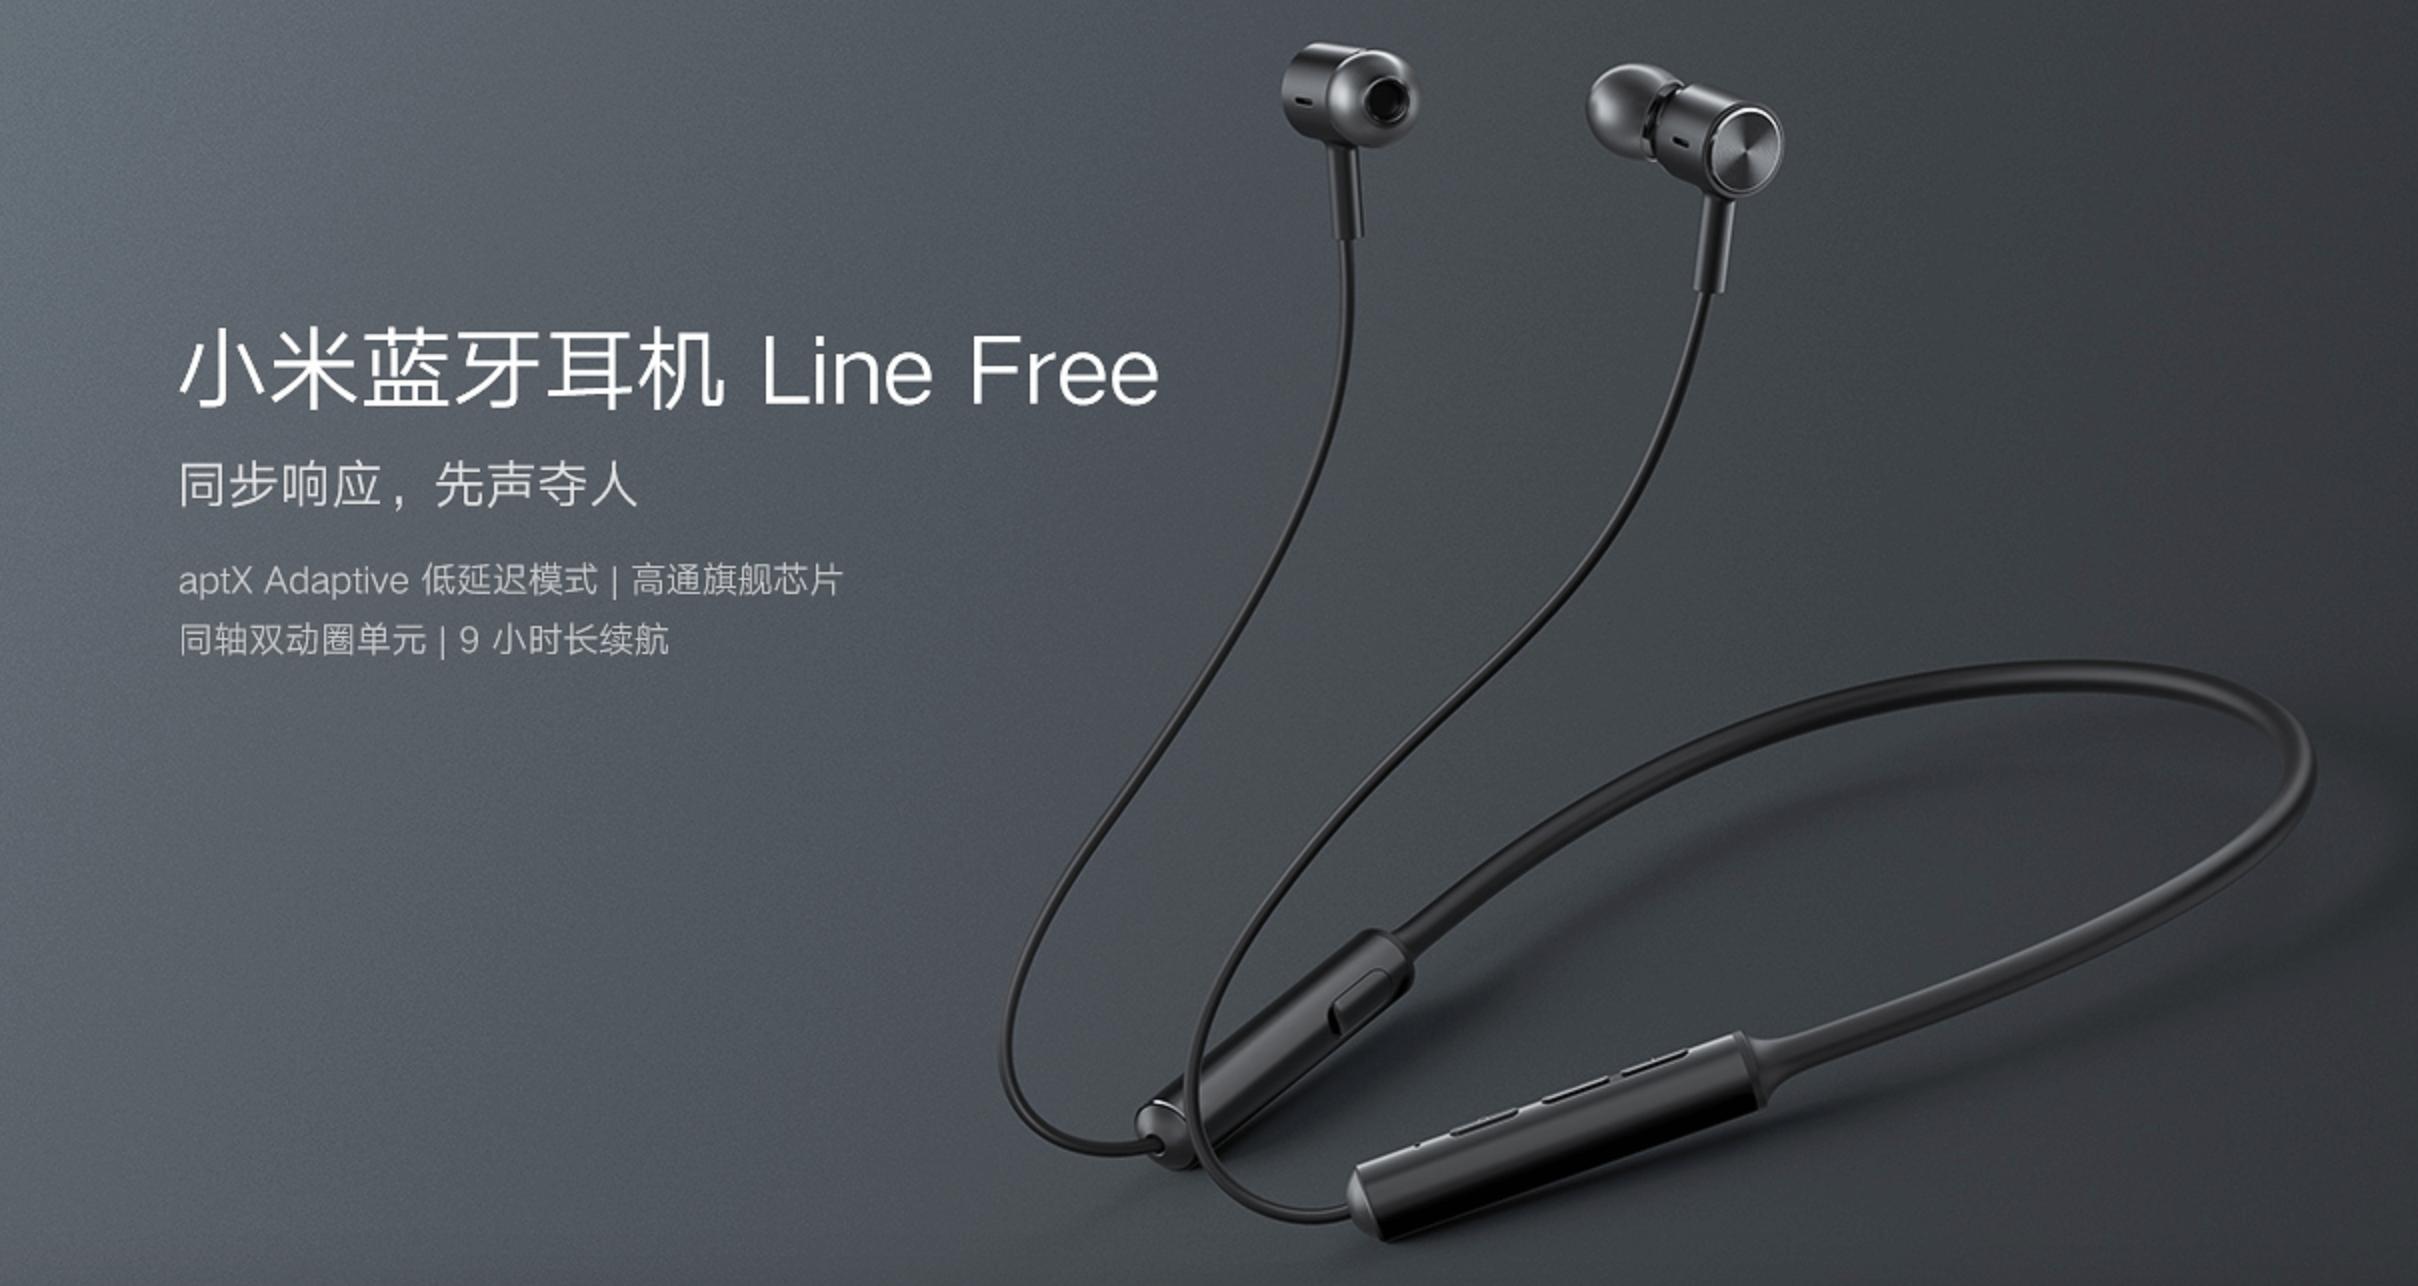 Xiaomi Line Free 1